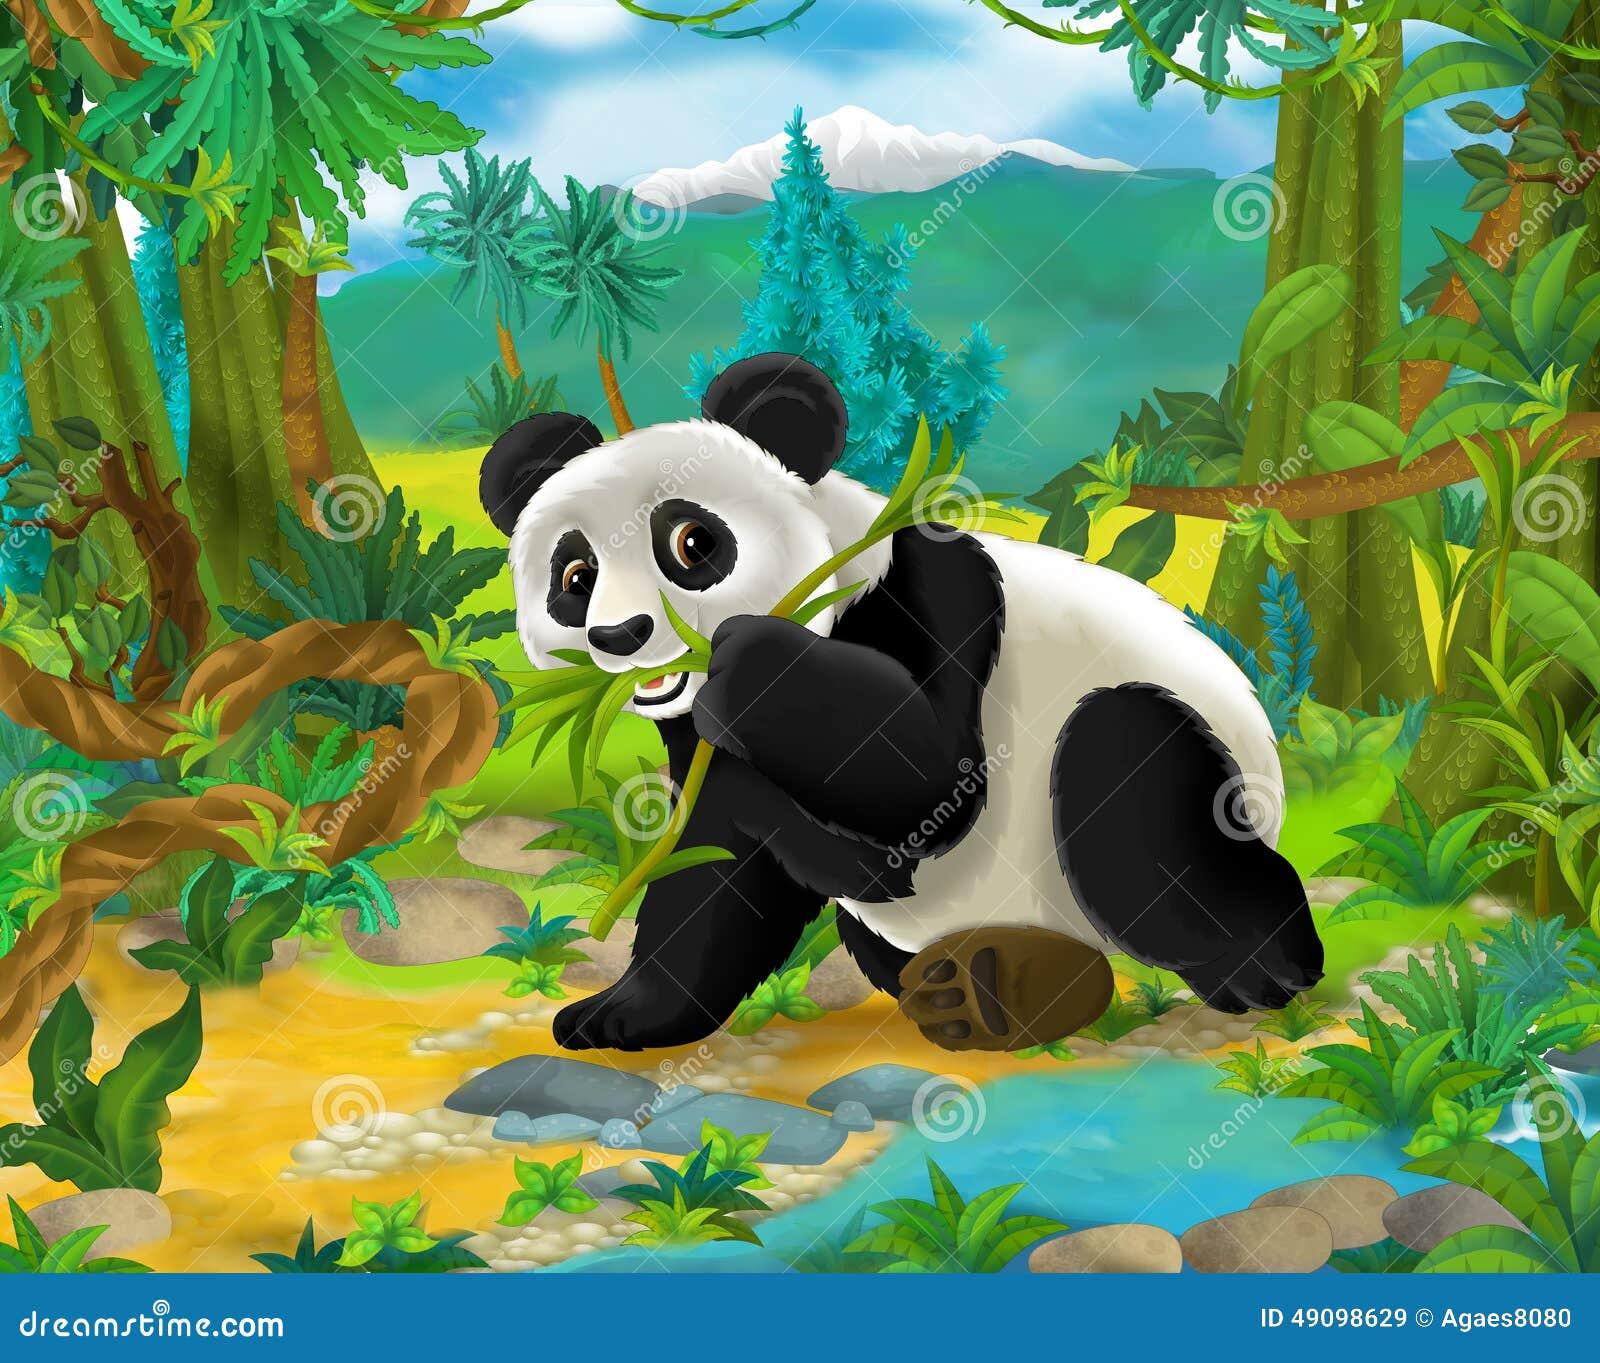 Cartoon Scene - Wild Asia Animals - Panda Bear Stock ... - photo#12